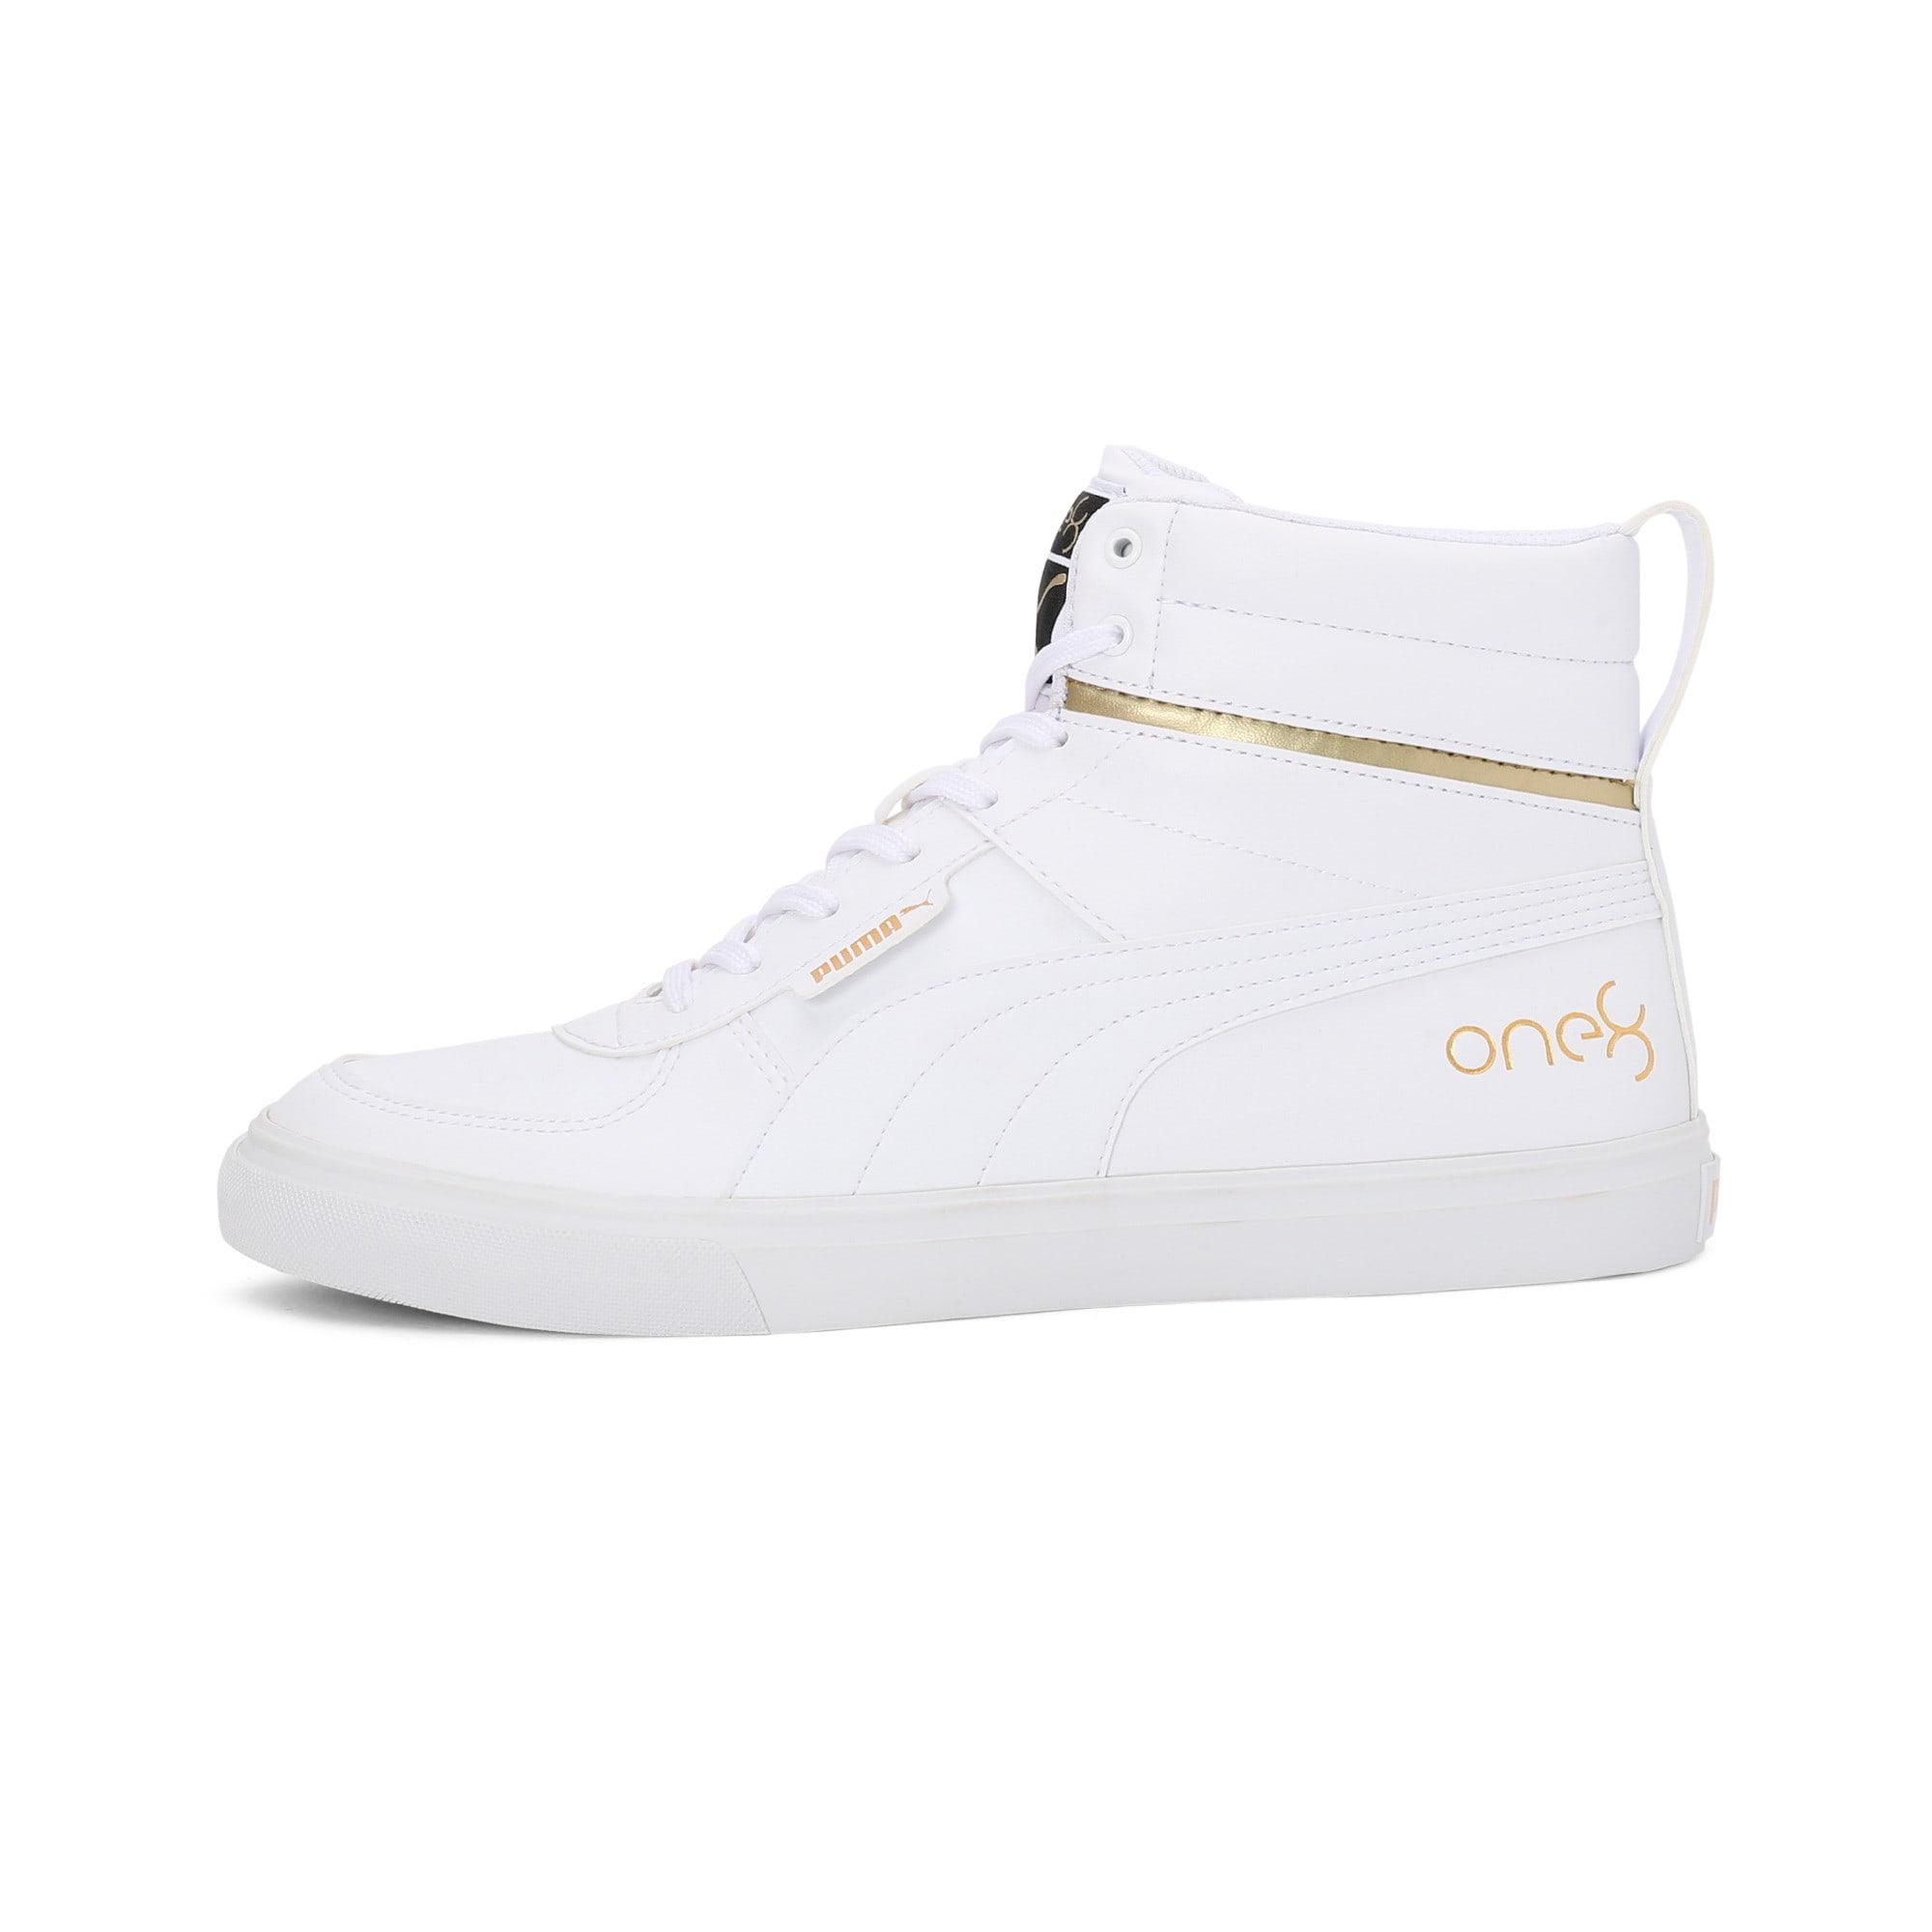 Thumbnail 1 of one8 Mid Men's Sneakers, Puma White-Puma Team Gold, medium-IND